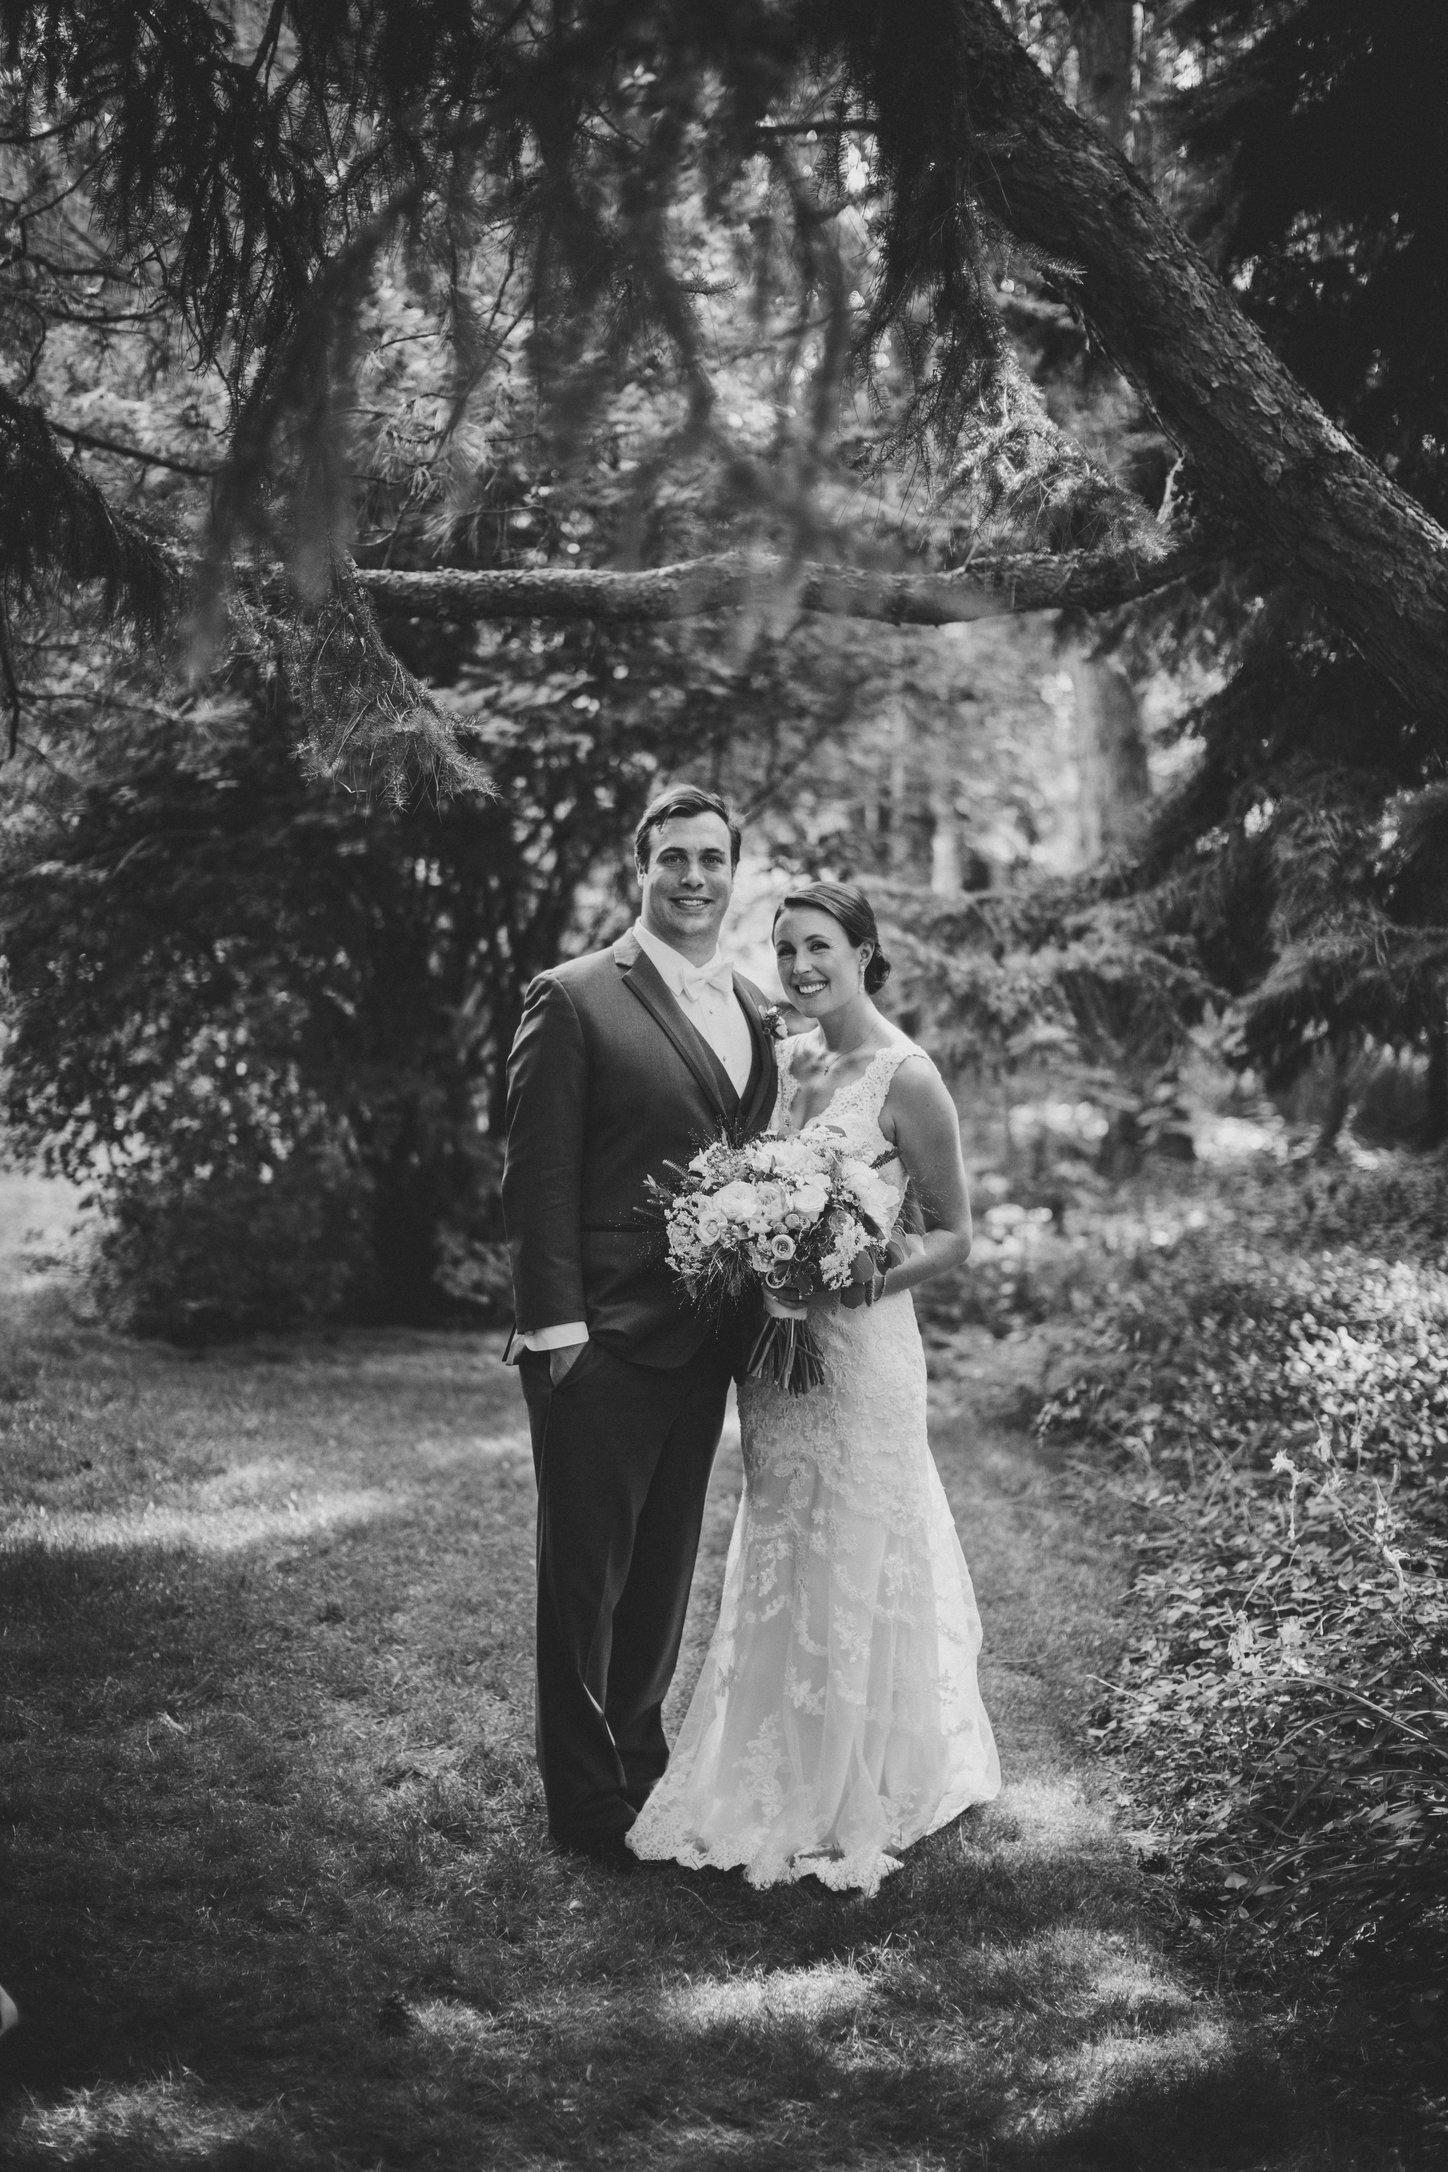 SandC-wedding-376.jpg